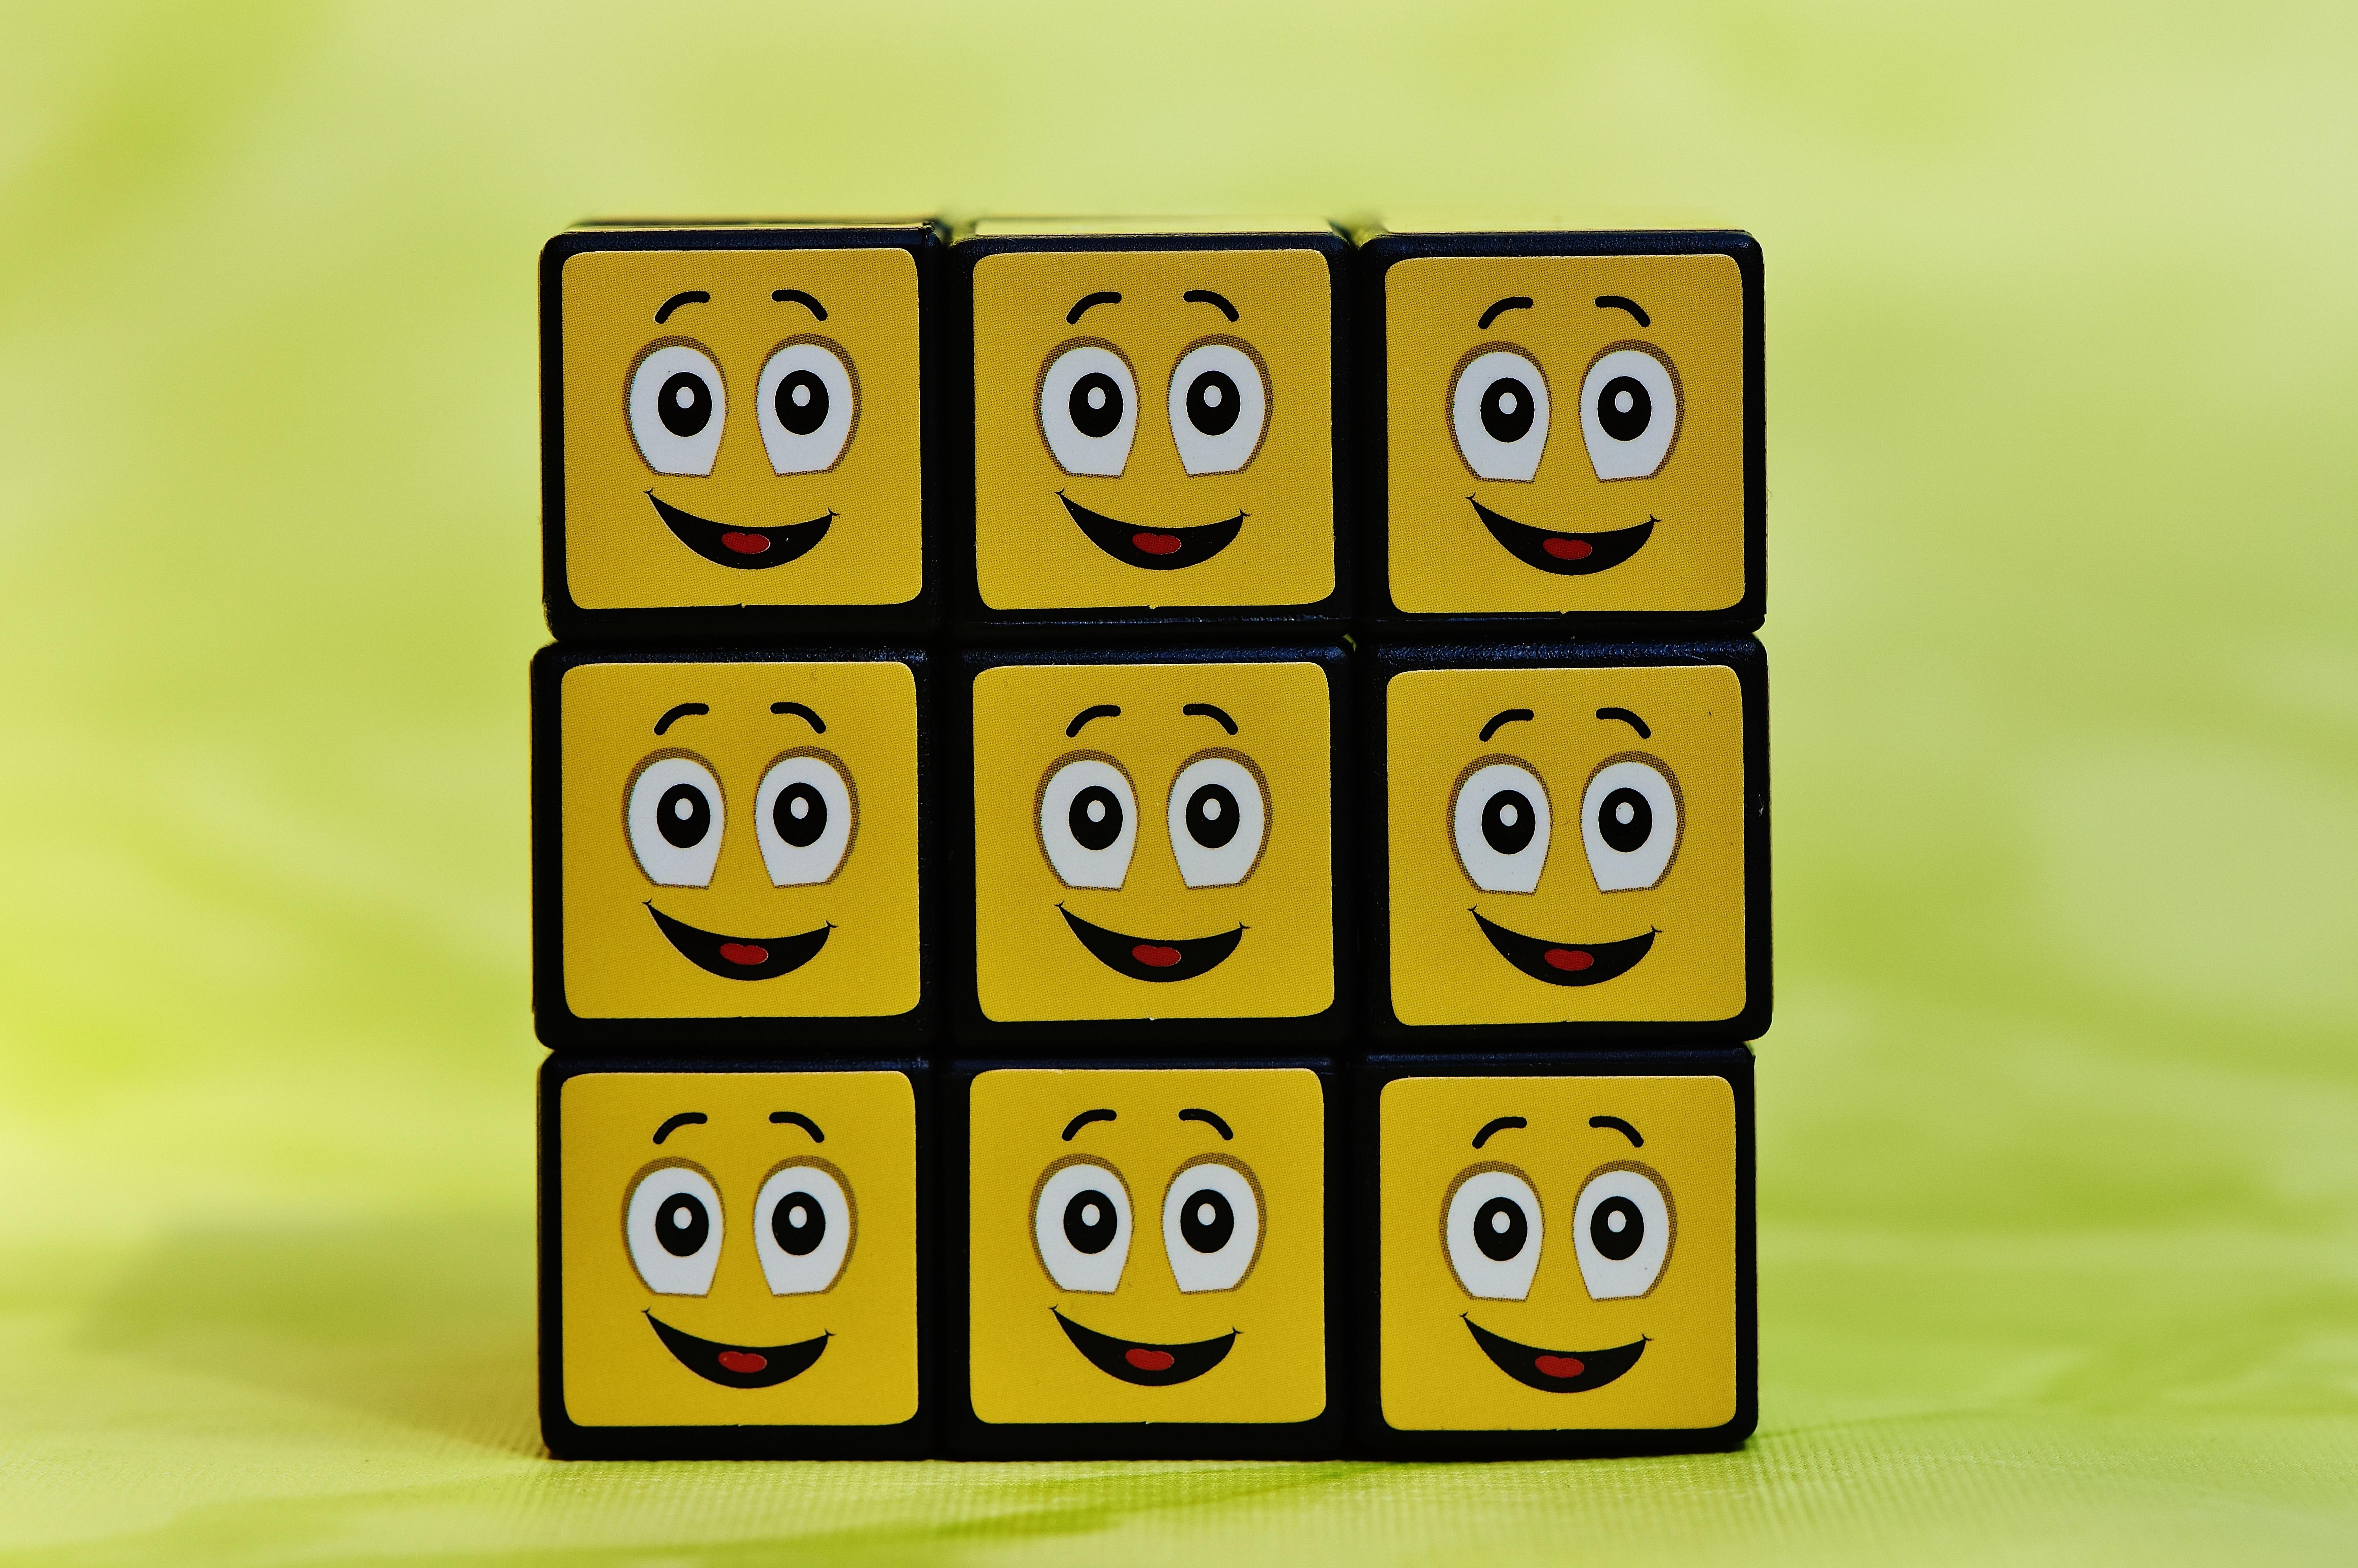 Gambar Jumlah Kuning Mainan Tersenyum Fon Lucu Kubus Wajah